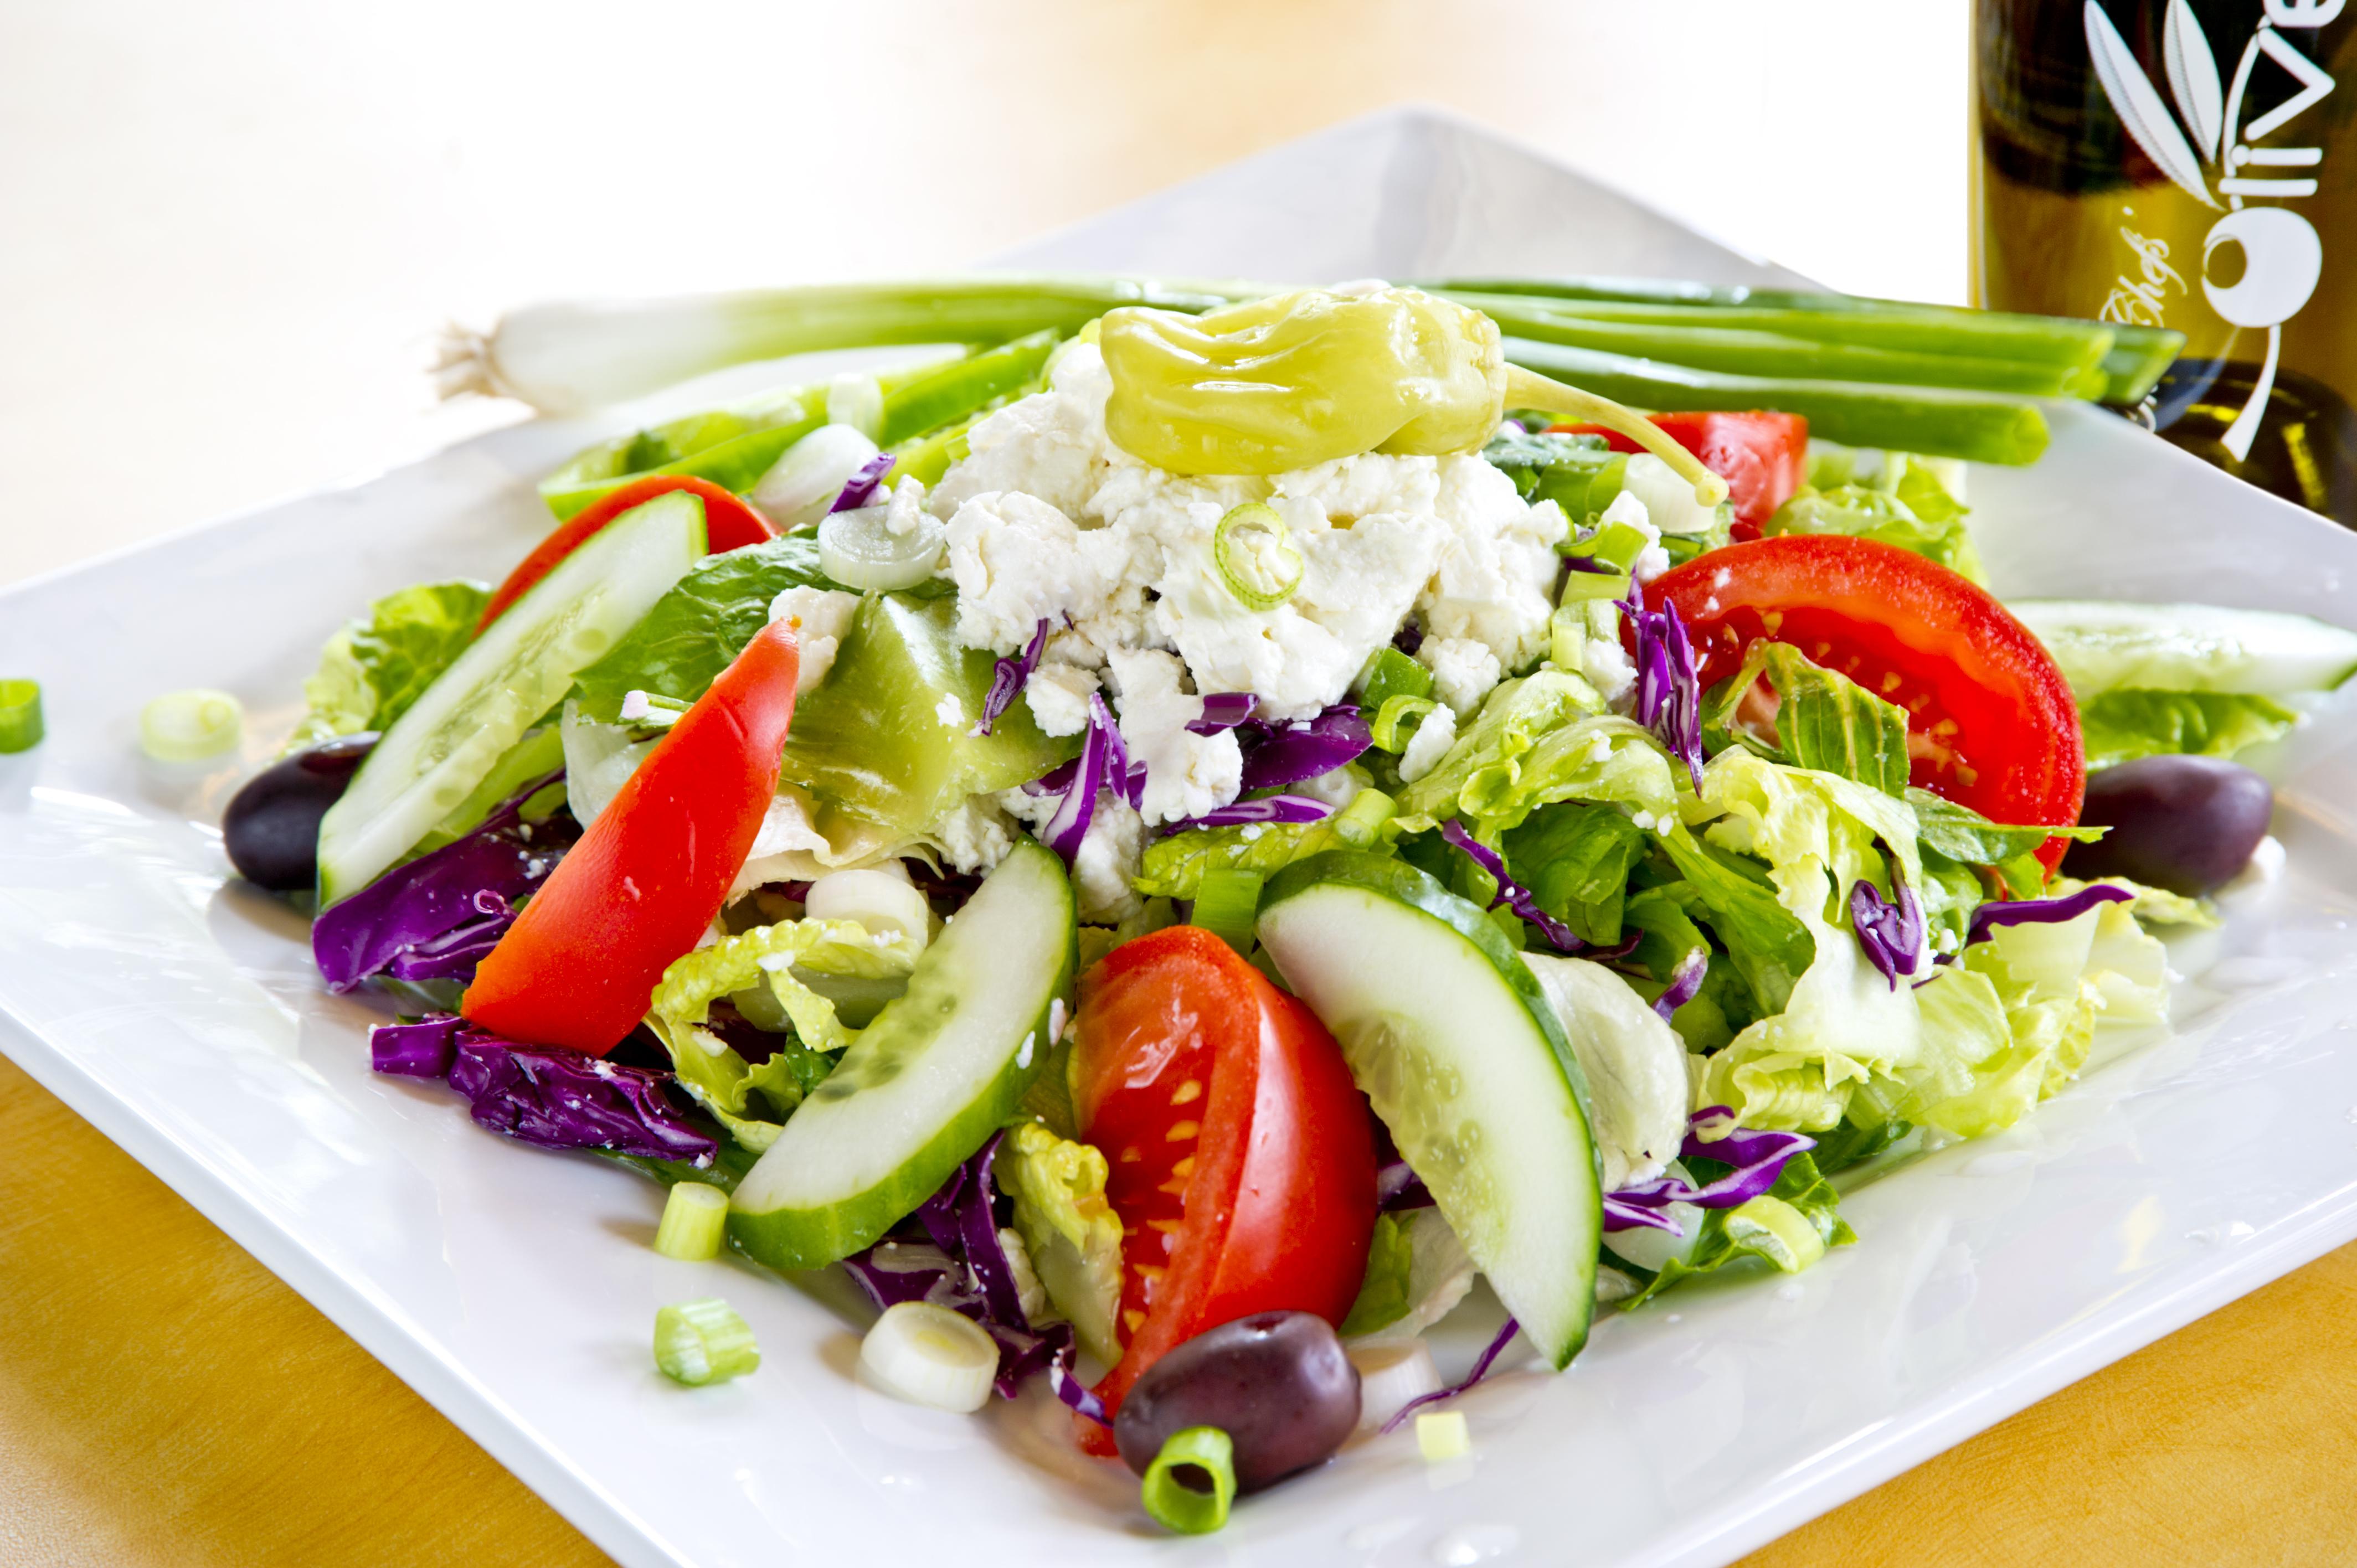 greek-salad-july-2013b.jpg